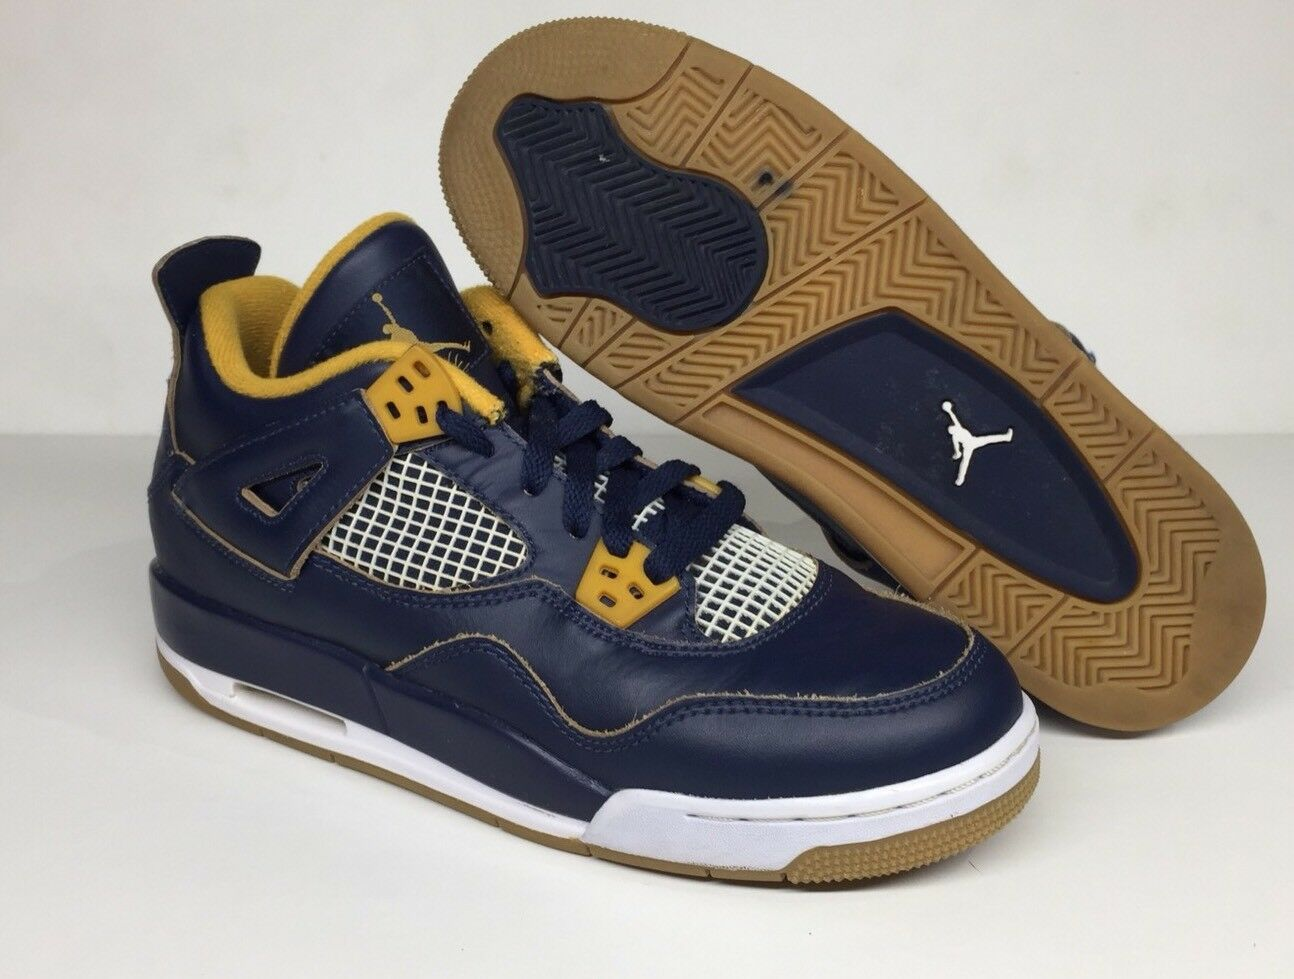 2016 Nike Air Jordan 4 IV Retro GS Dunk From Above Navy Comfortable Cheap women's shoes women's shoes